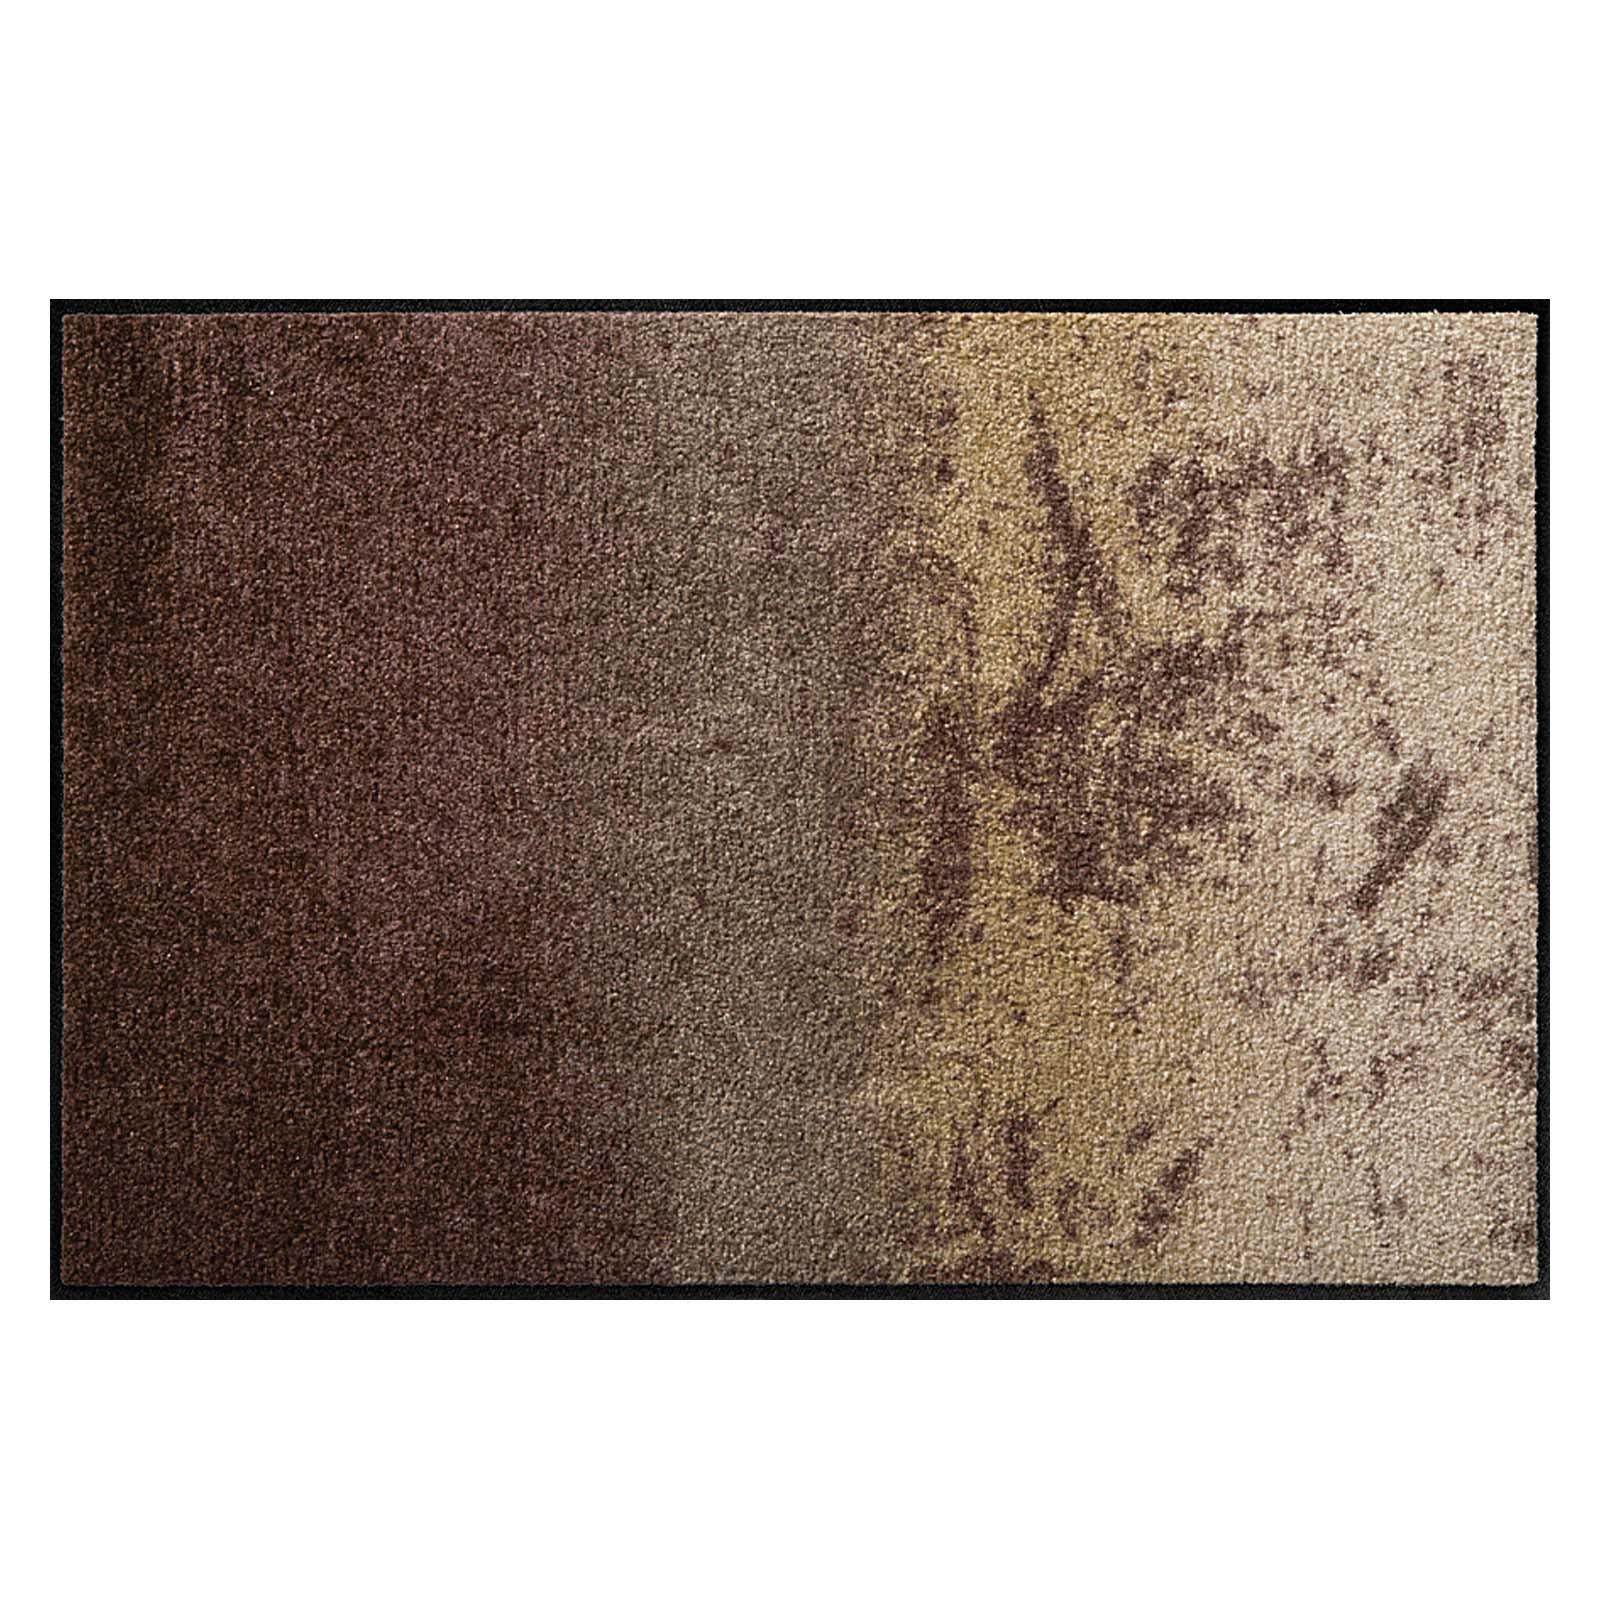 salonloewe fu matte waschbar shabby brown 50x75 cm sld0814 050x075 eingang garten fu matten. Black Bedroom Furniture Sets. Home Design Ideas